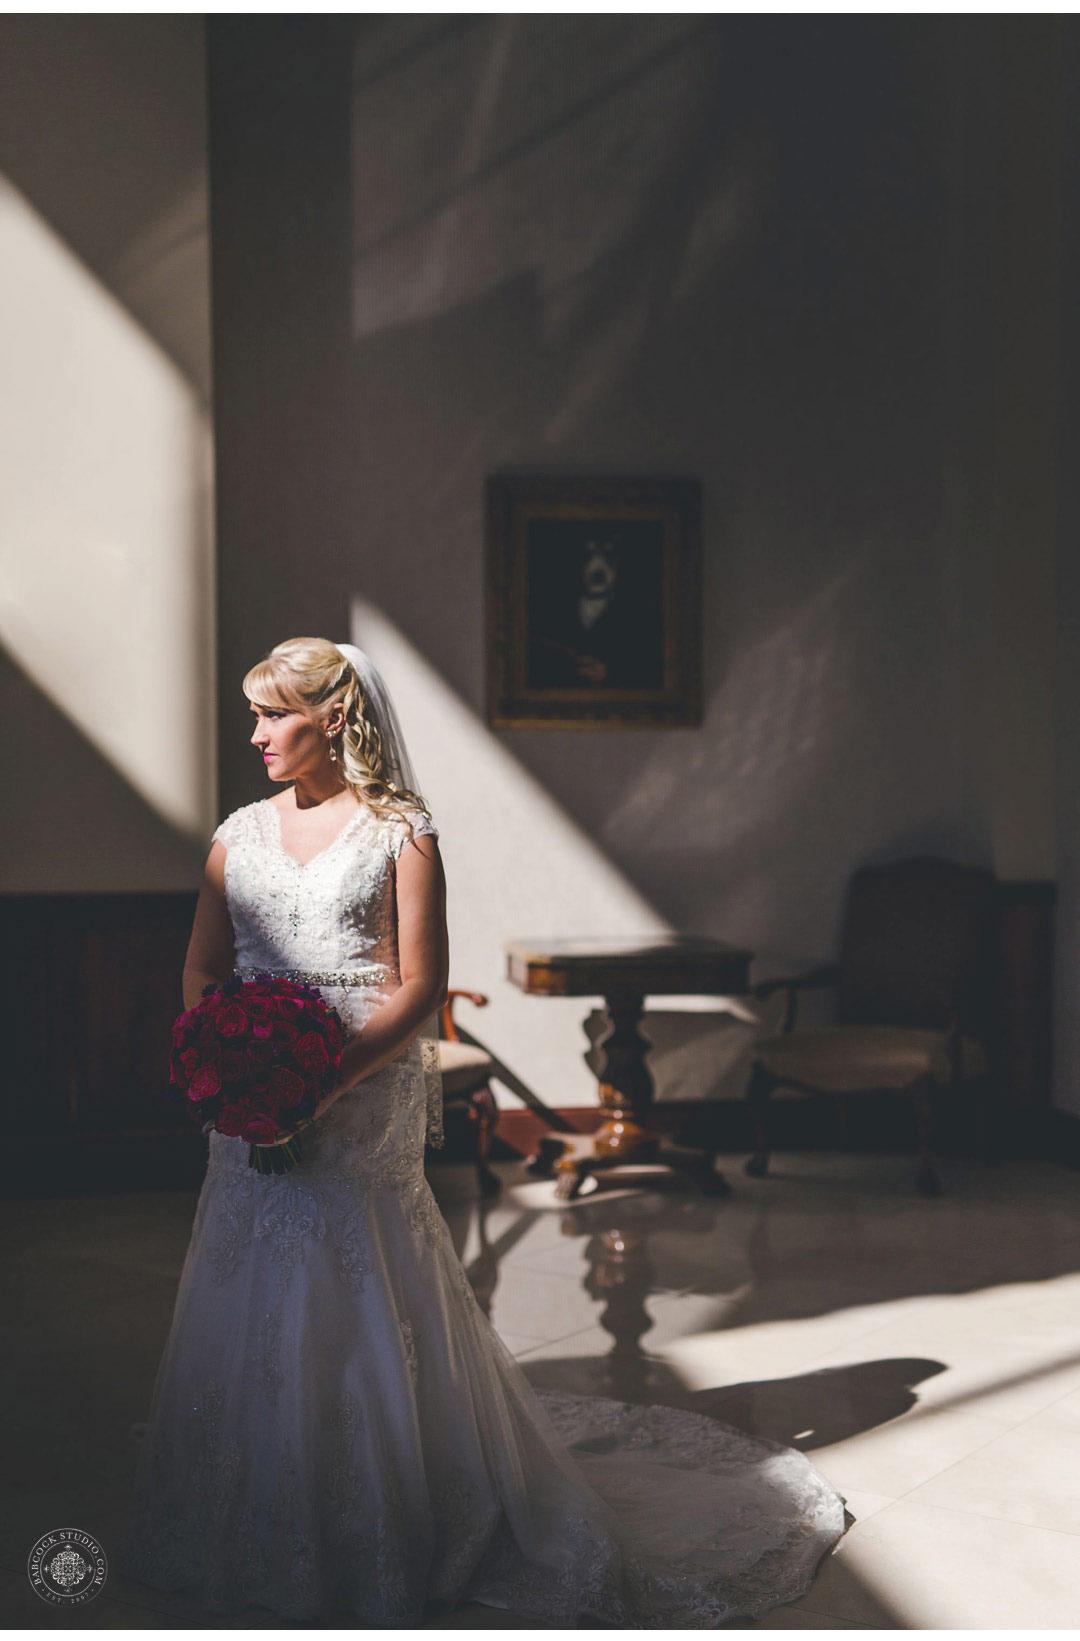 brya-tyler-wedding-photographer-dayton-ohio-13.jpg